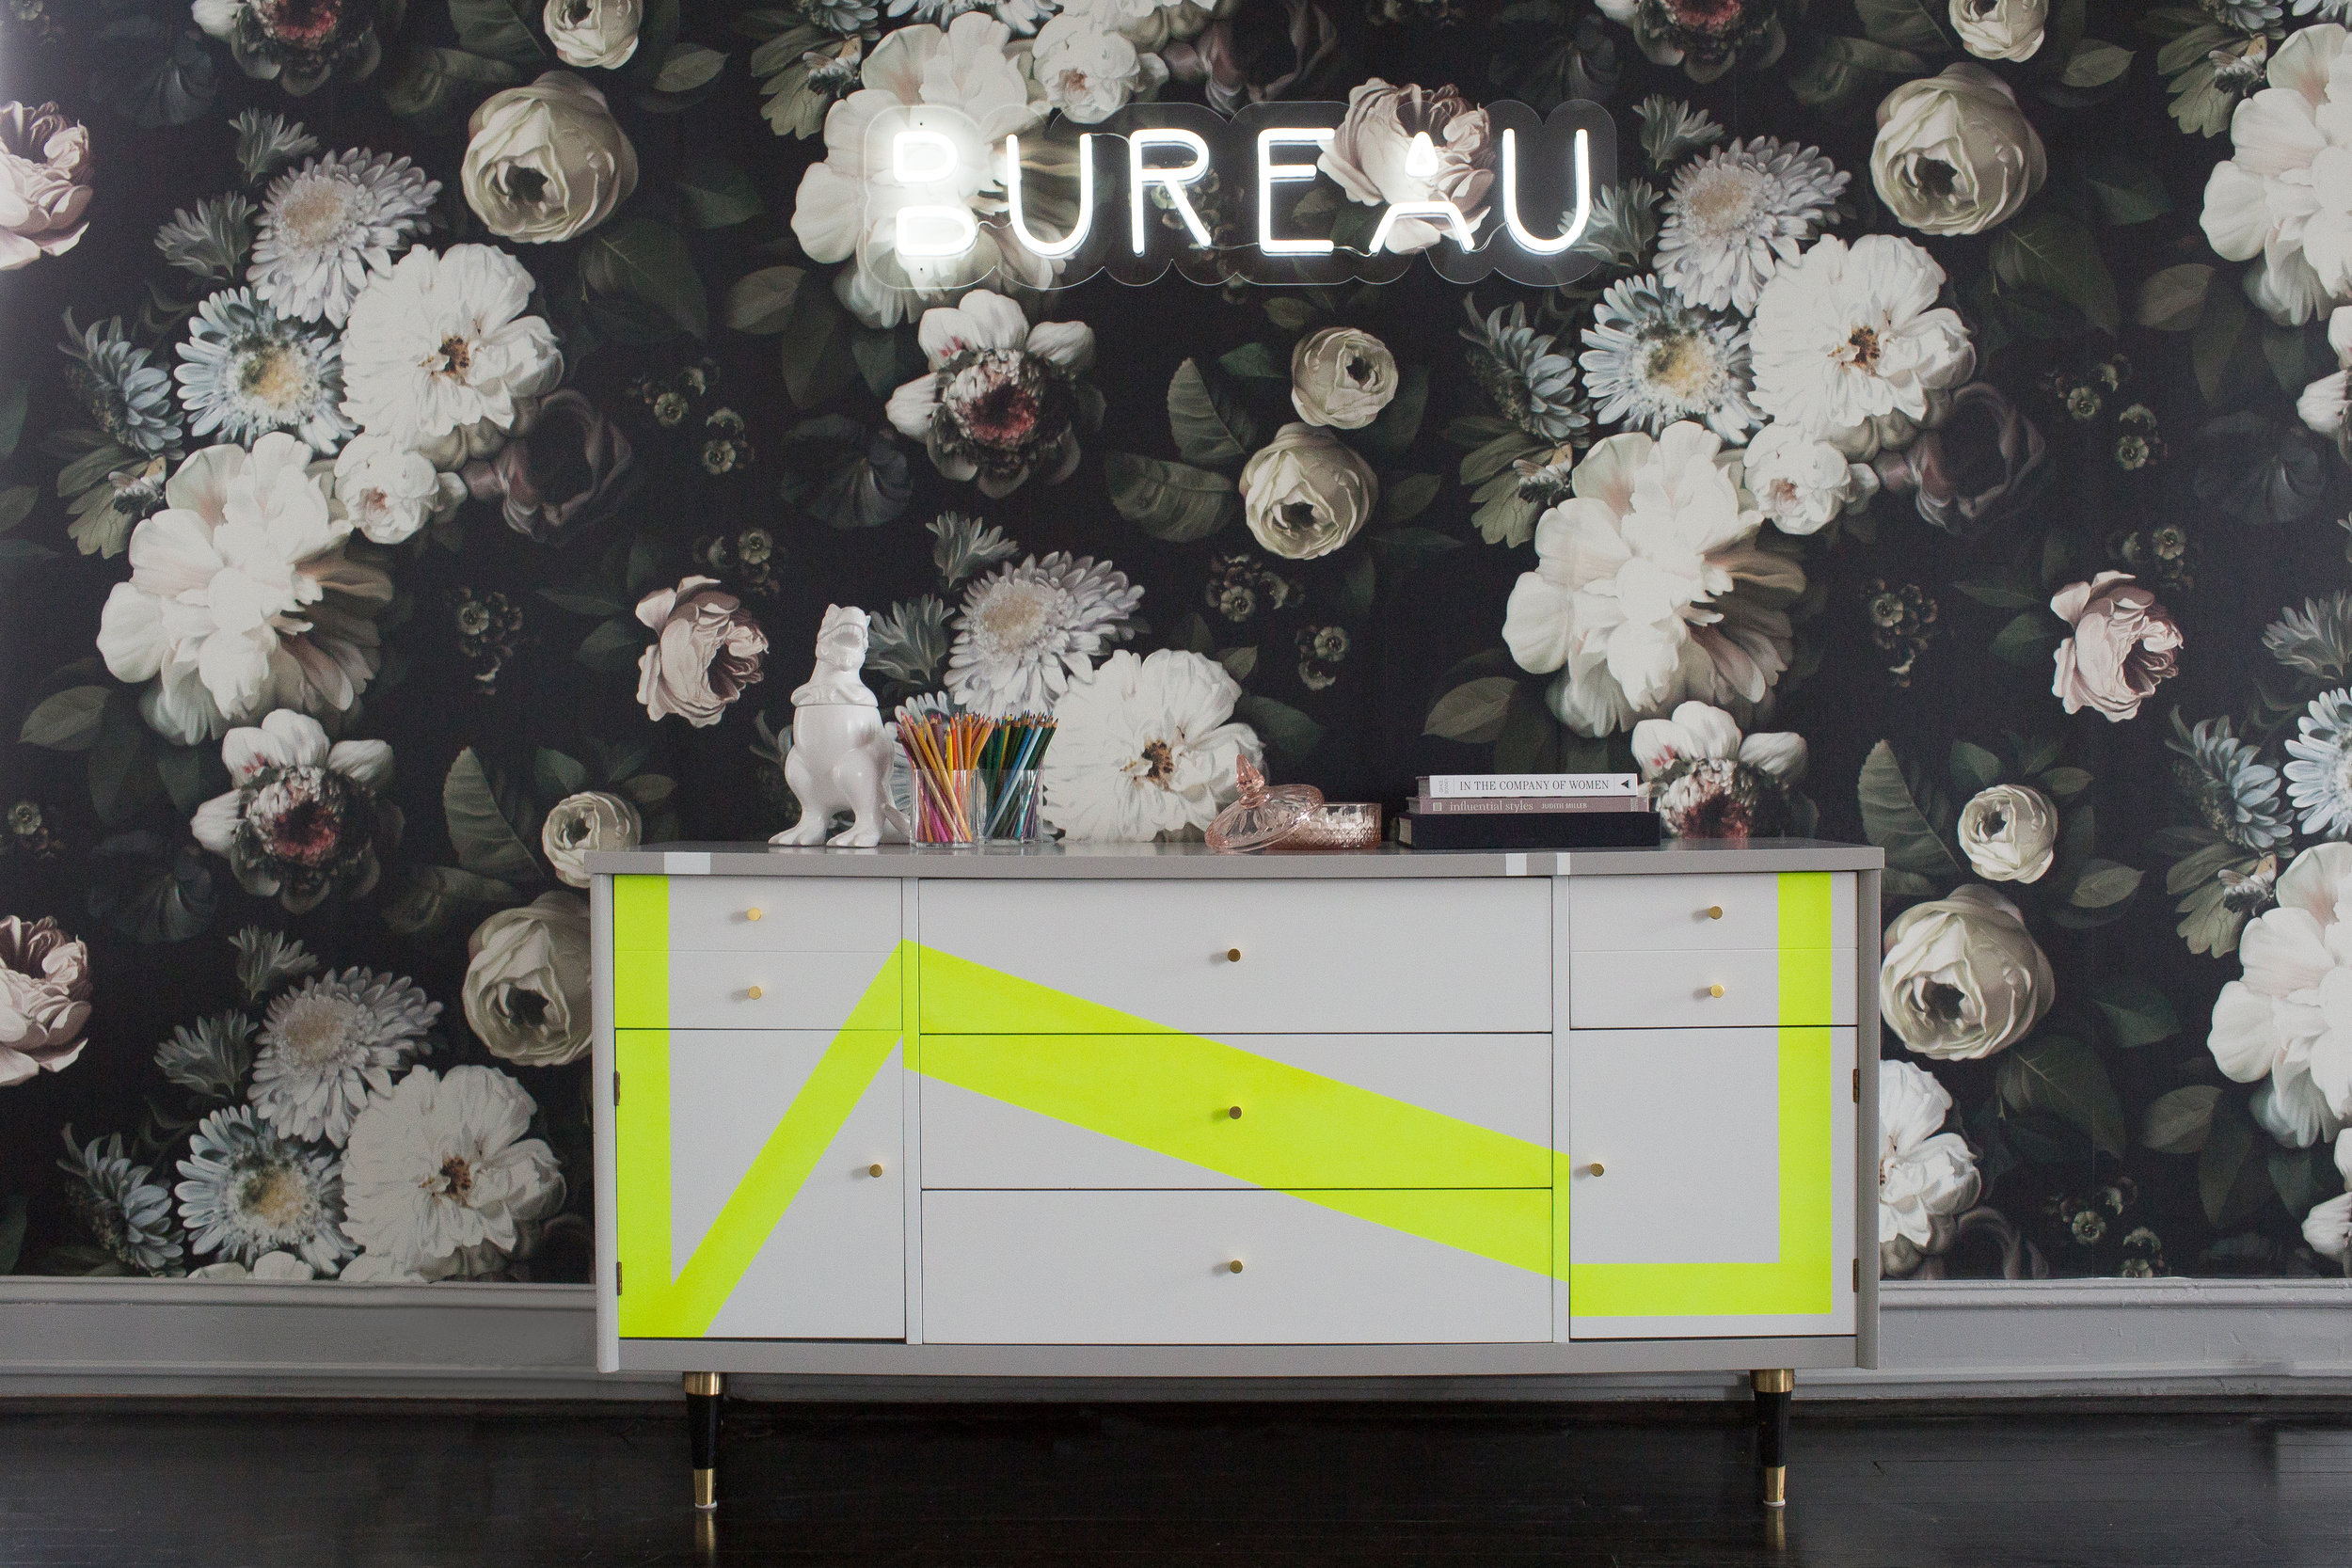 Custom credenza for    Bureau Studio   Interior Design:  Kerra Michele Interiors  • Photography:  Reema Desai